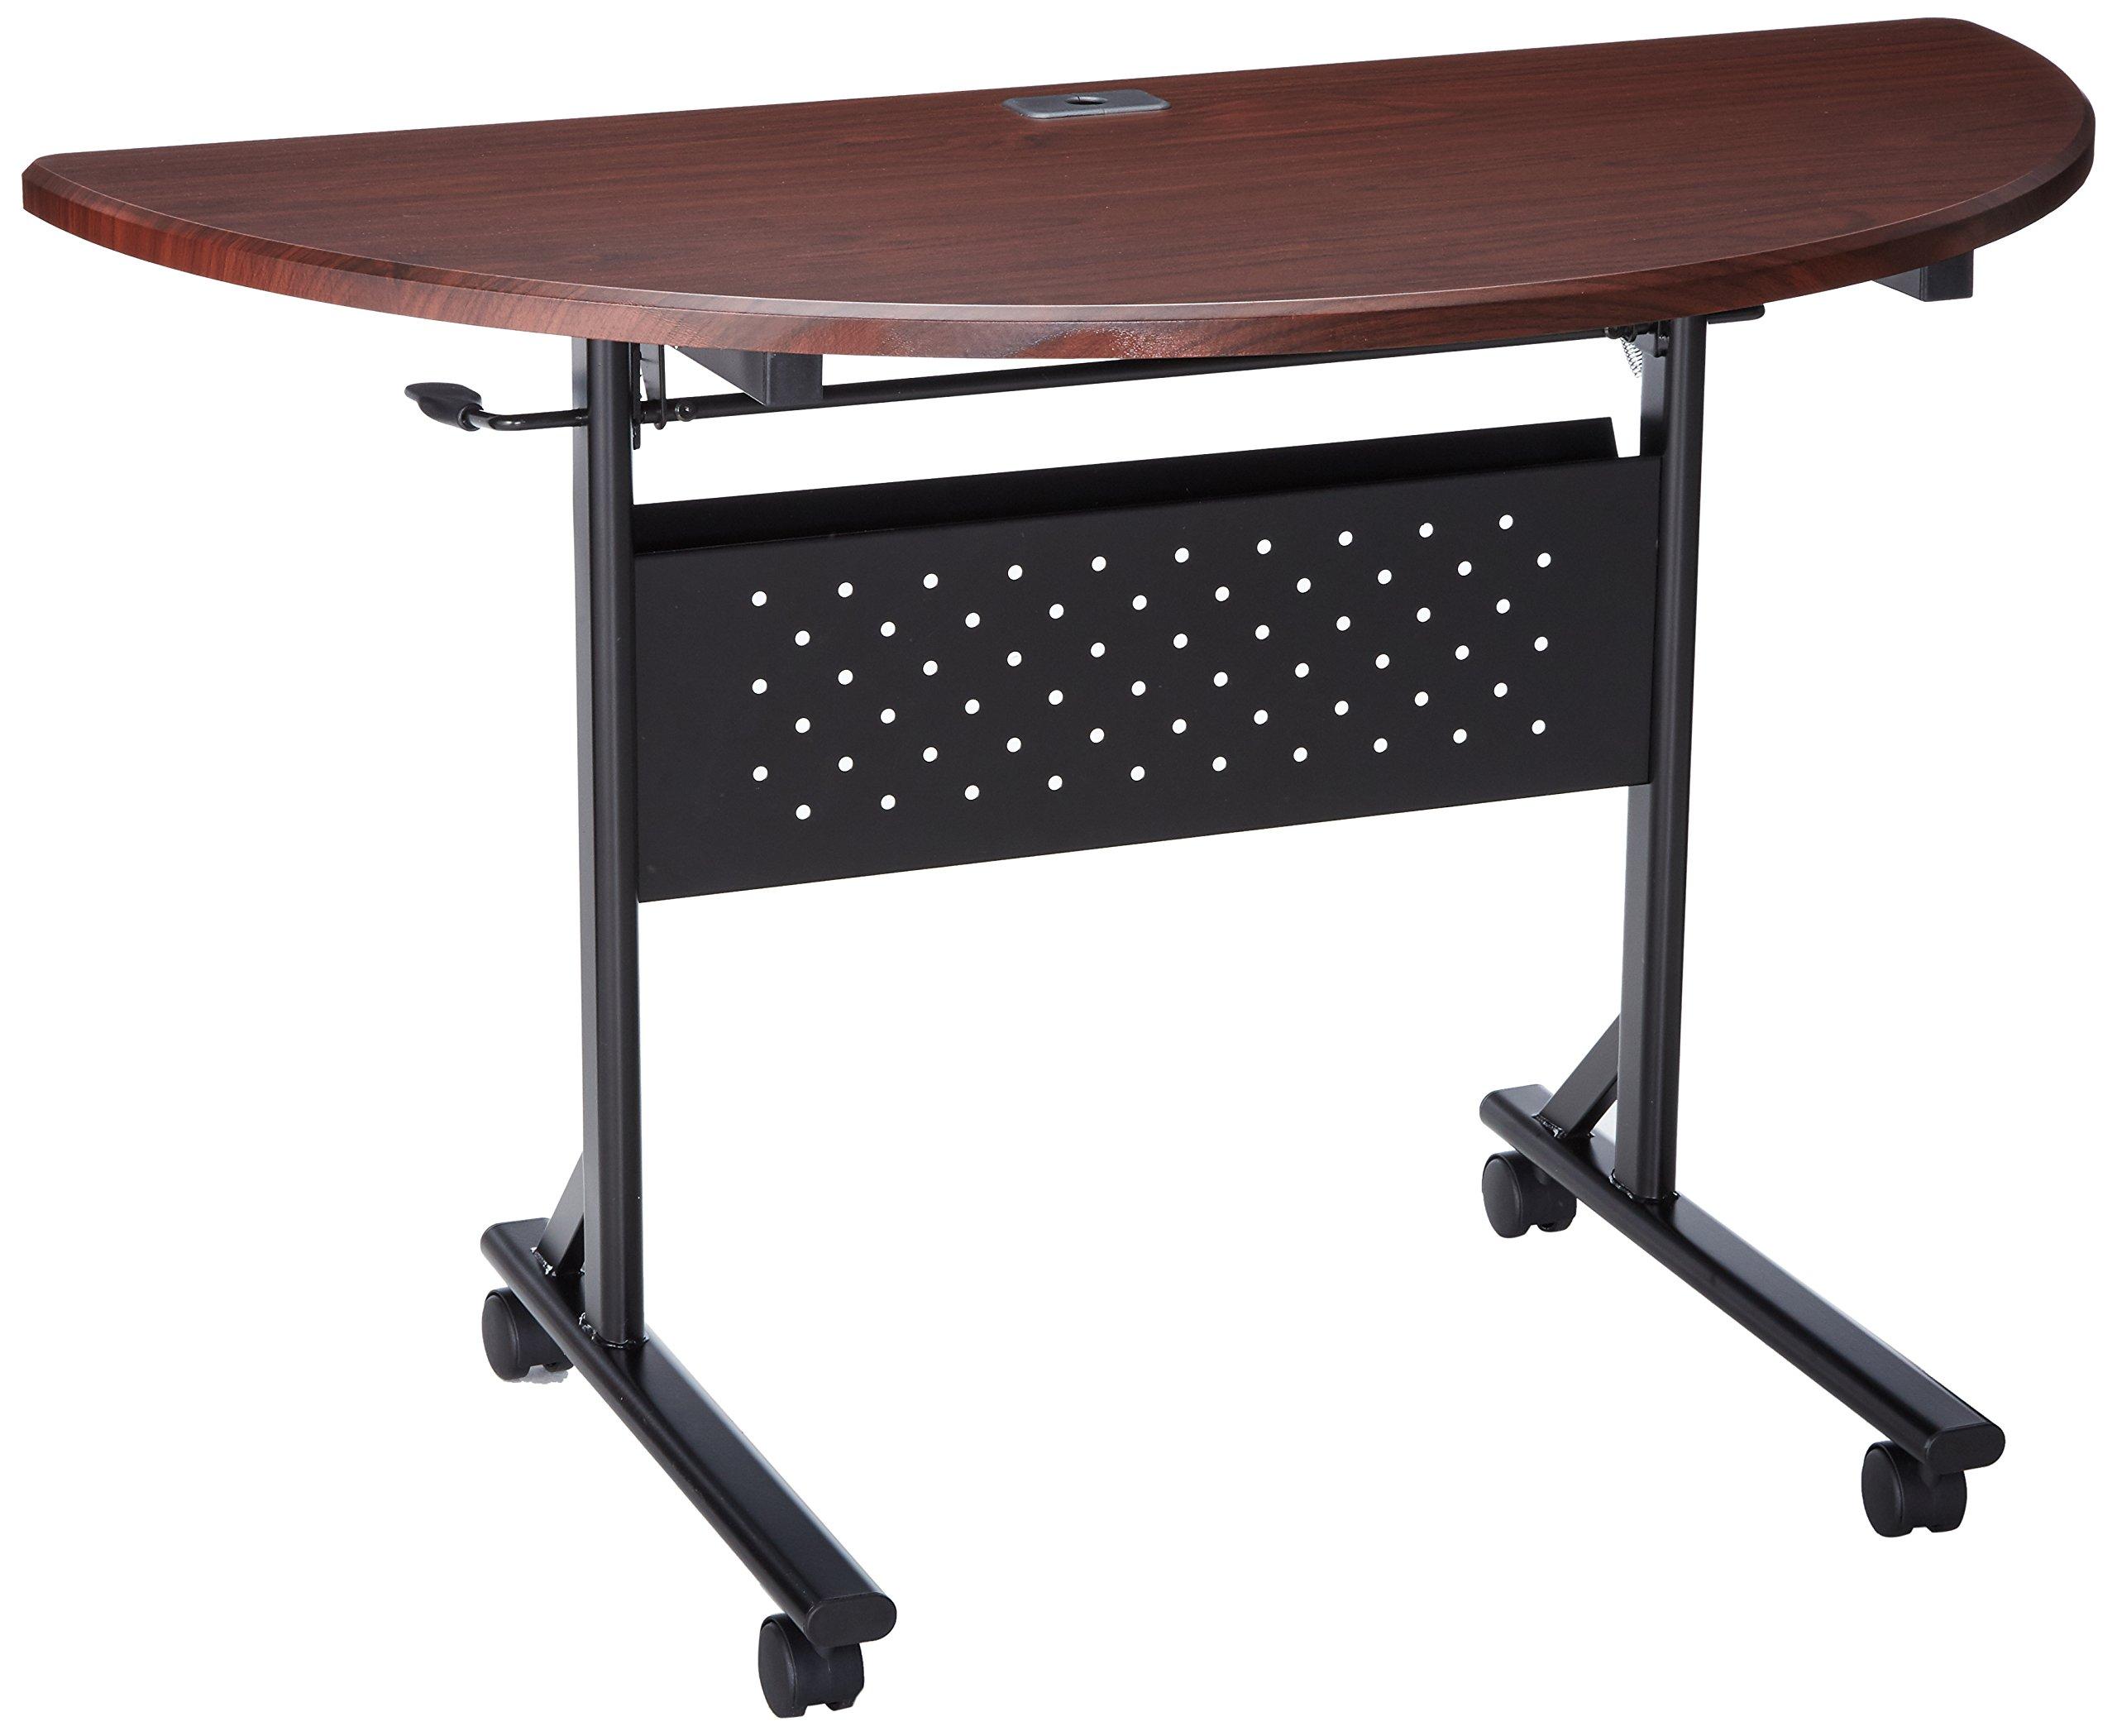 Lorell LLR60668 Flipper Training Tables, 2.95'' Height X 26.77'' Width X 73.23'' Length, Mahogany by Lorell